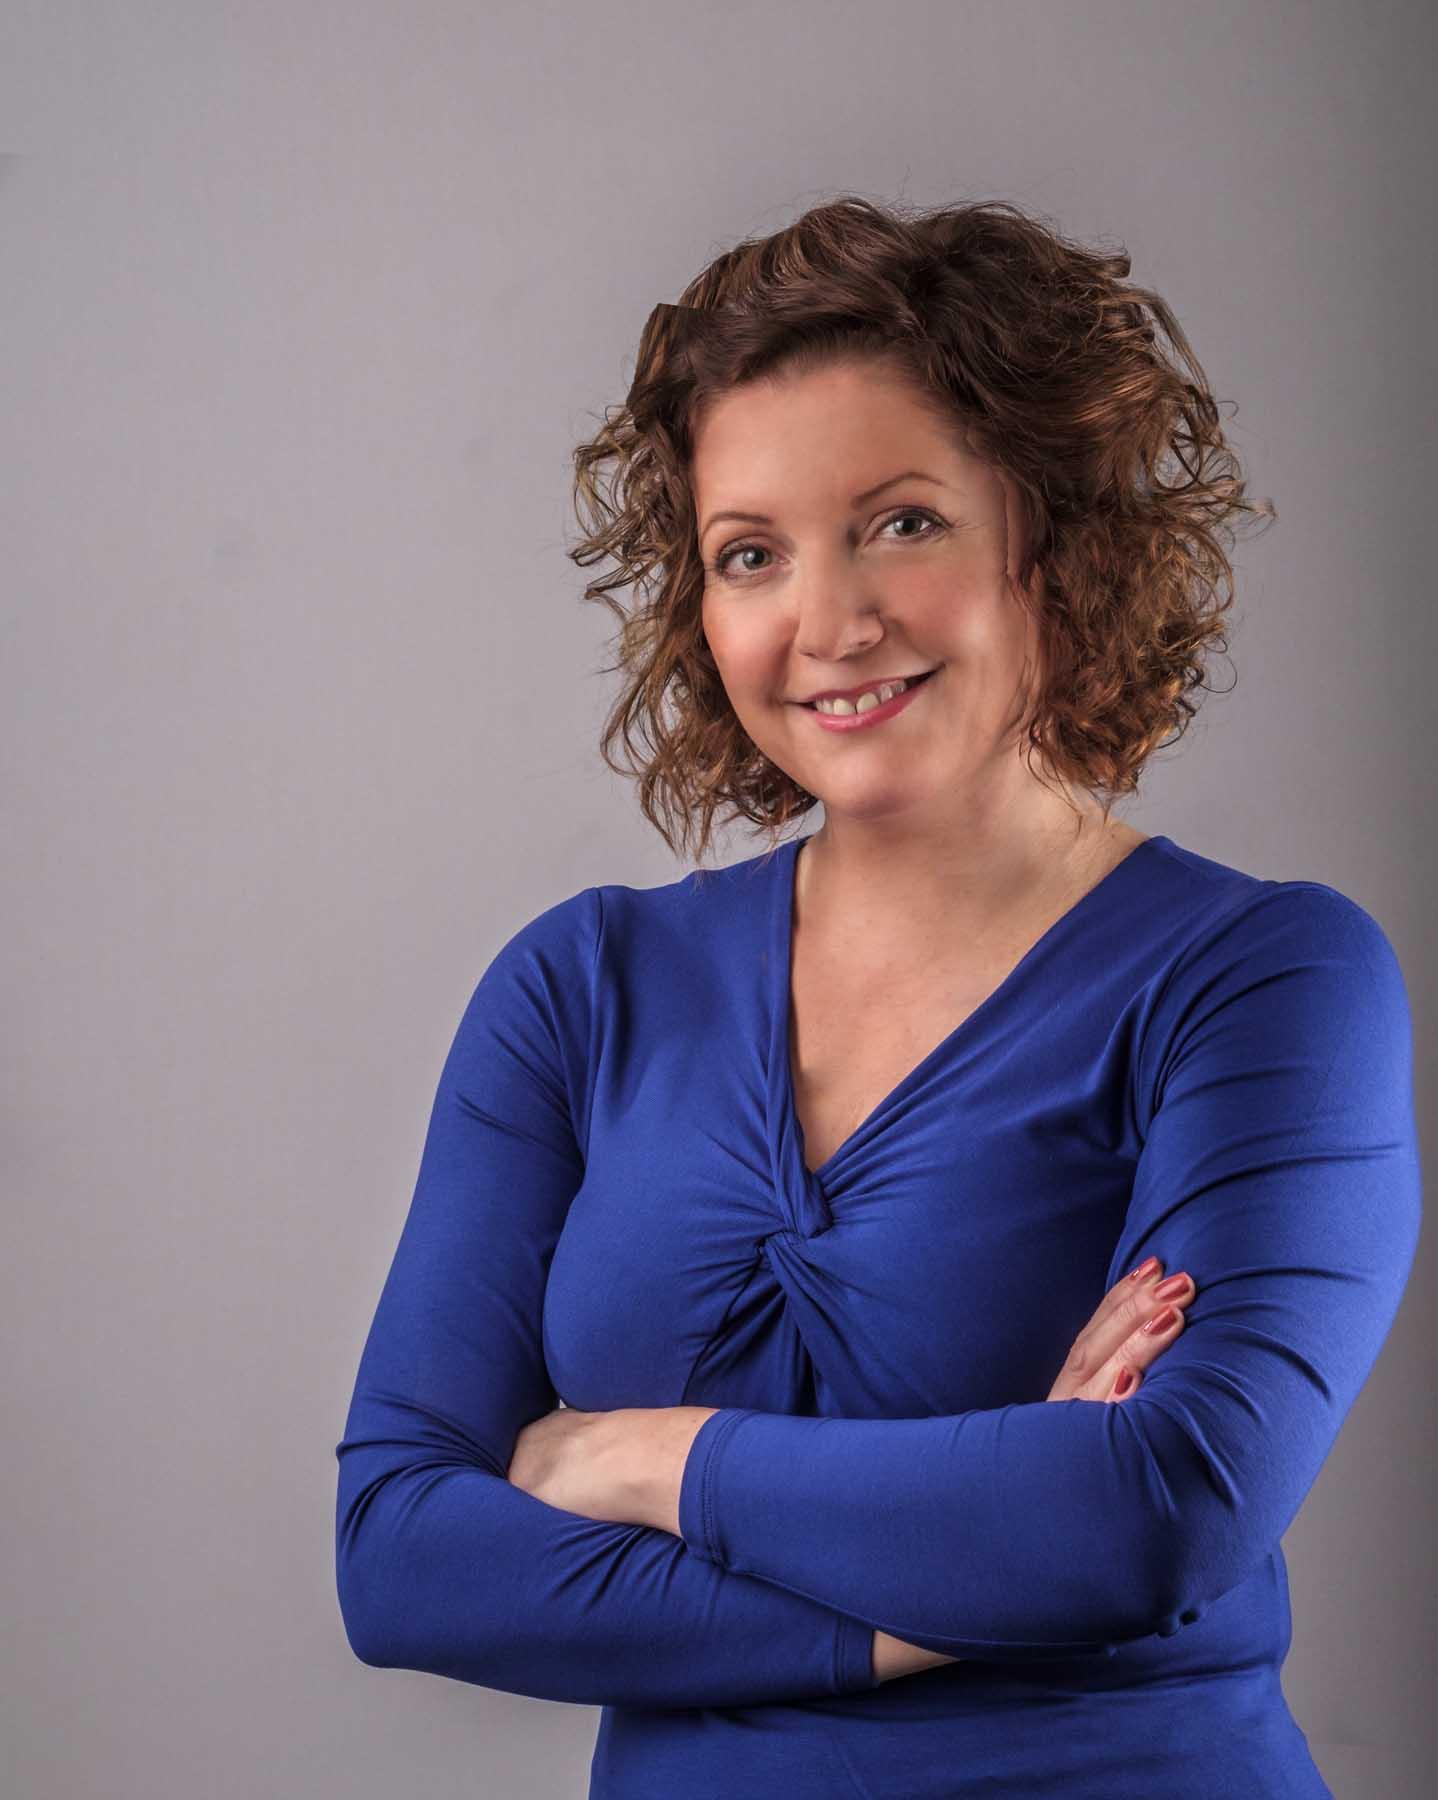 Dr Elizabeth Roberts, PhD, MSc, BSc, SRD